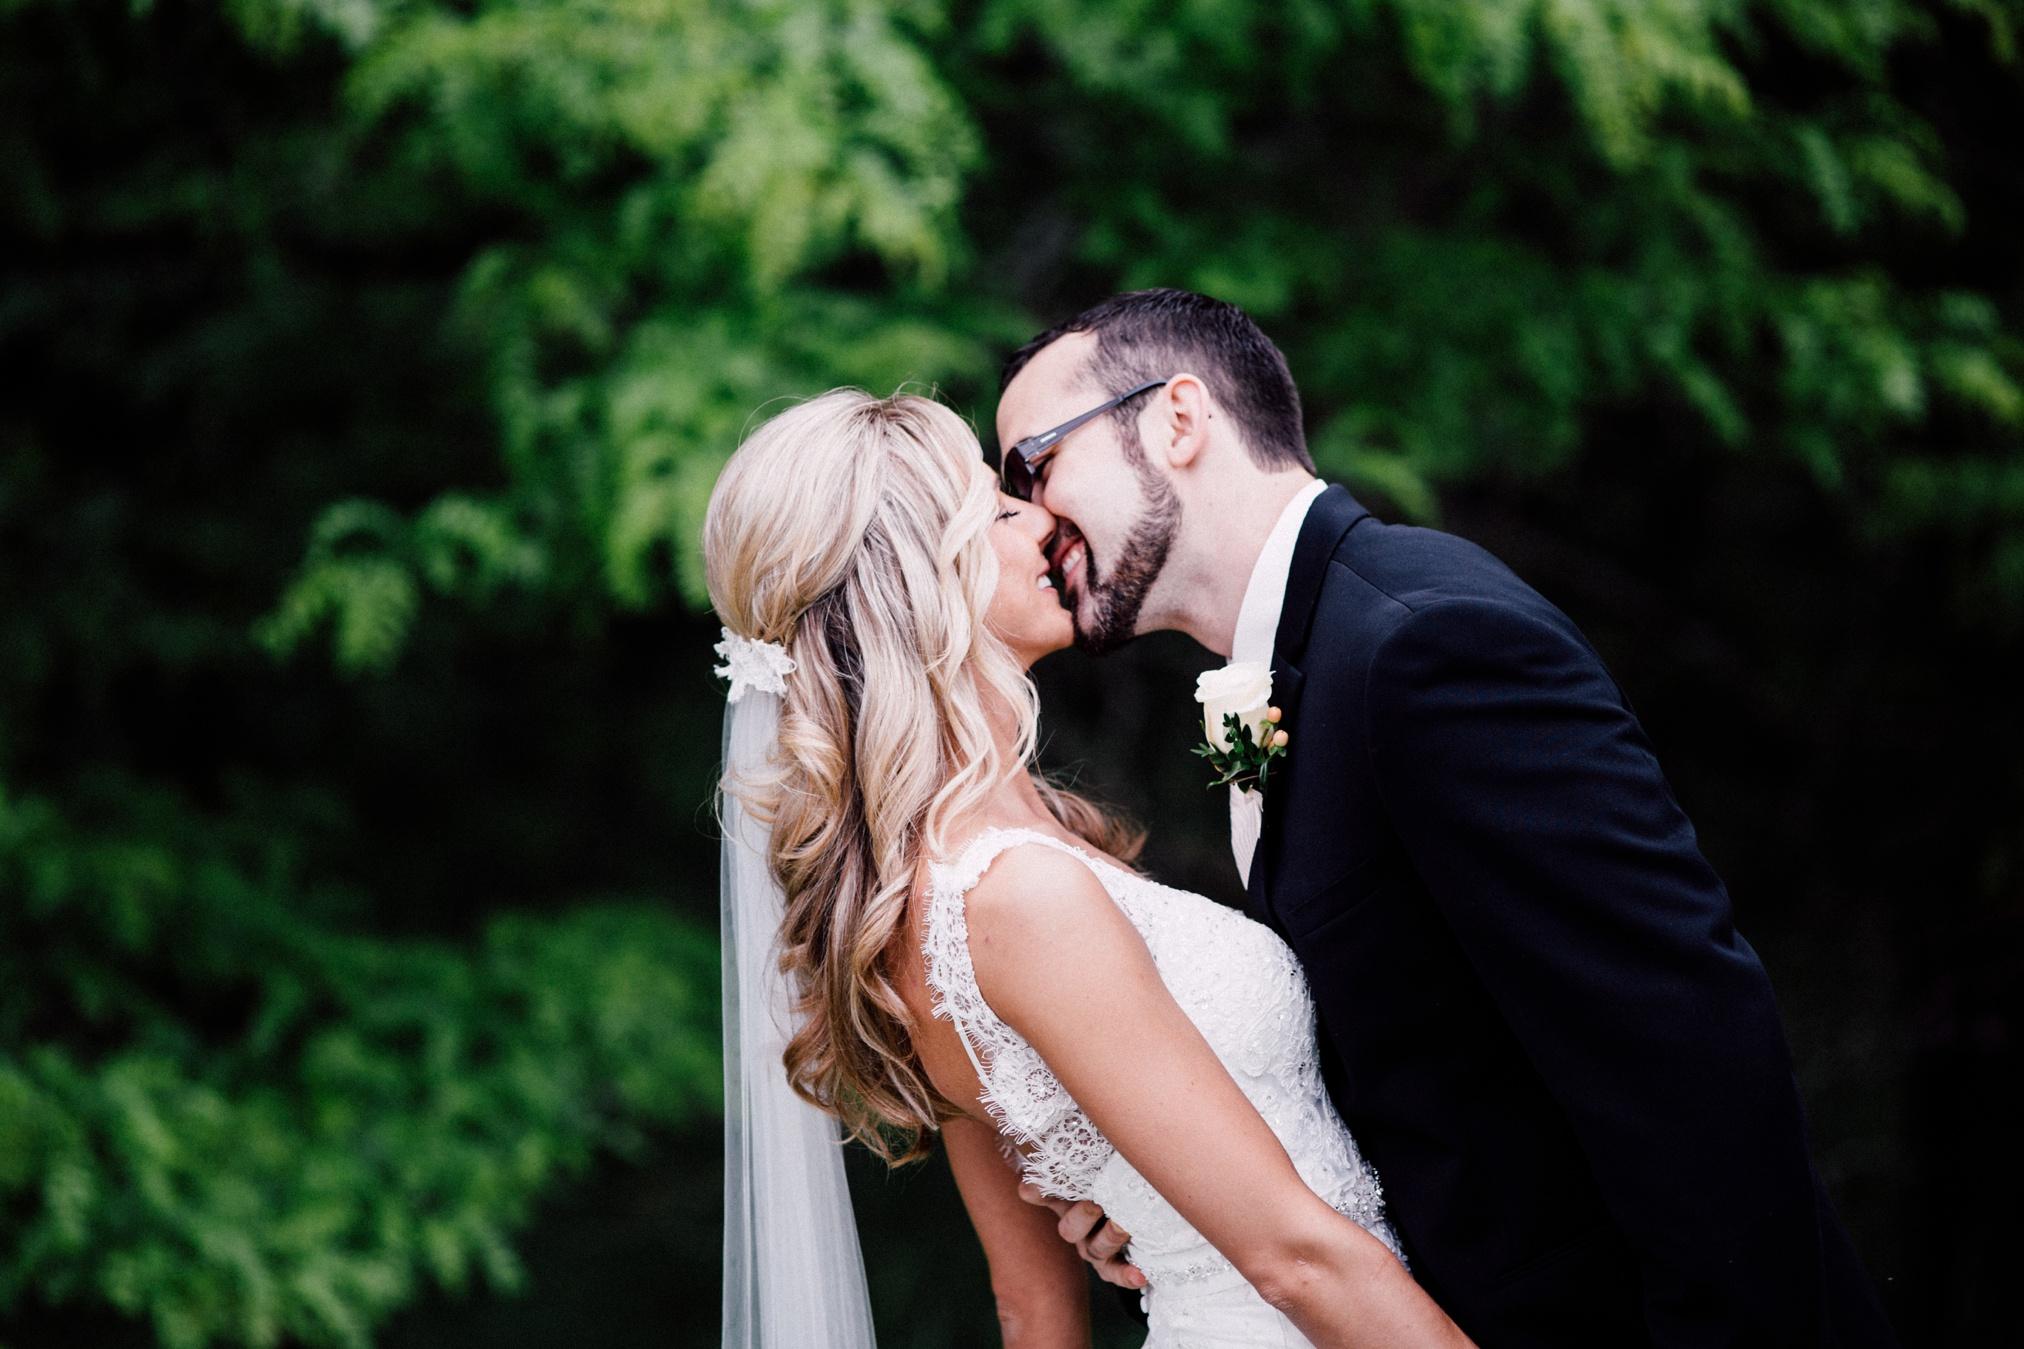 schmid_wedding-657.jpg